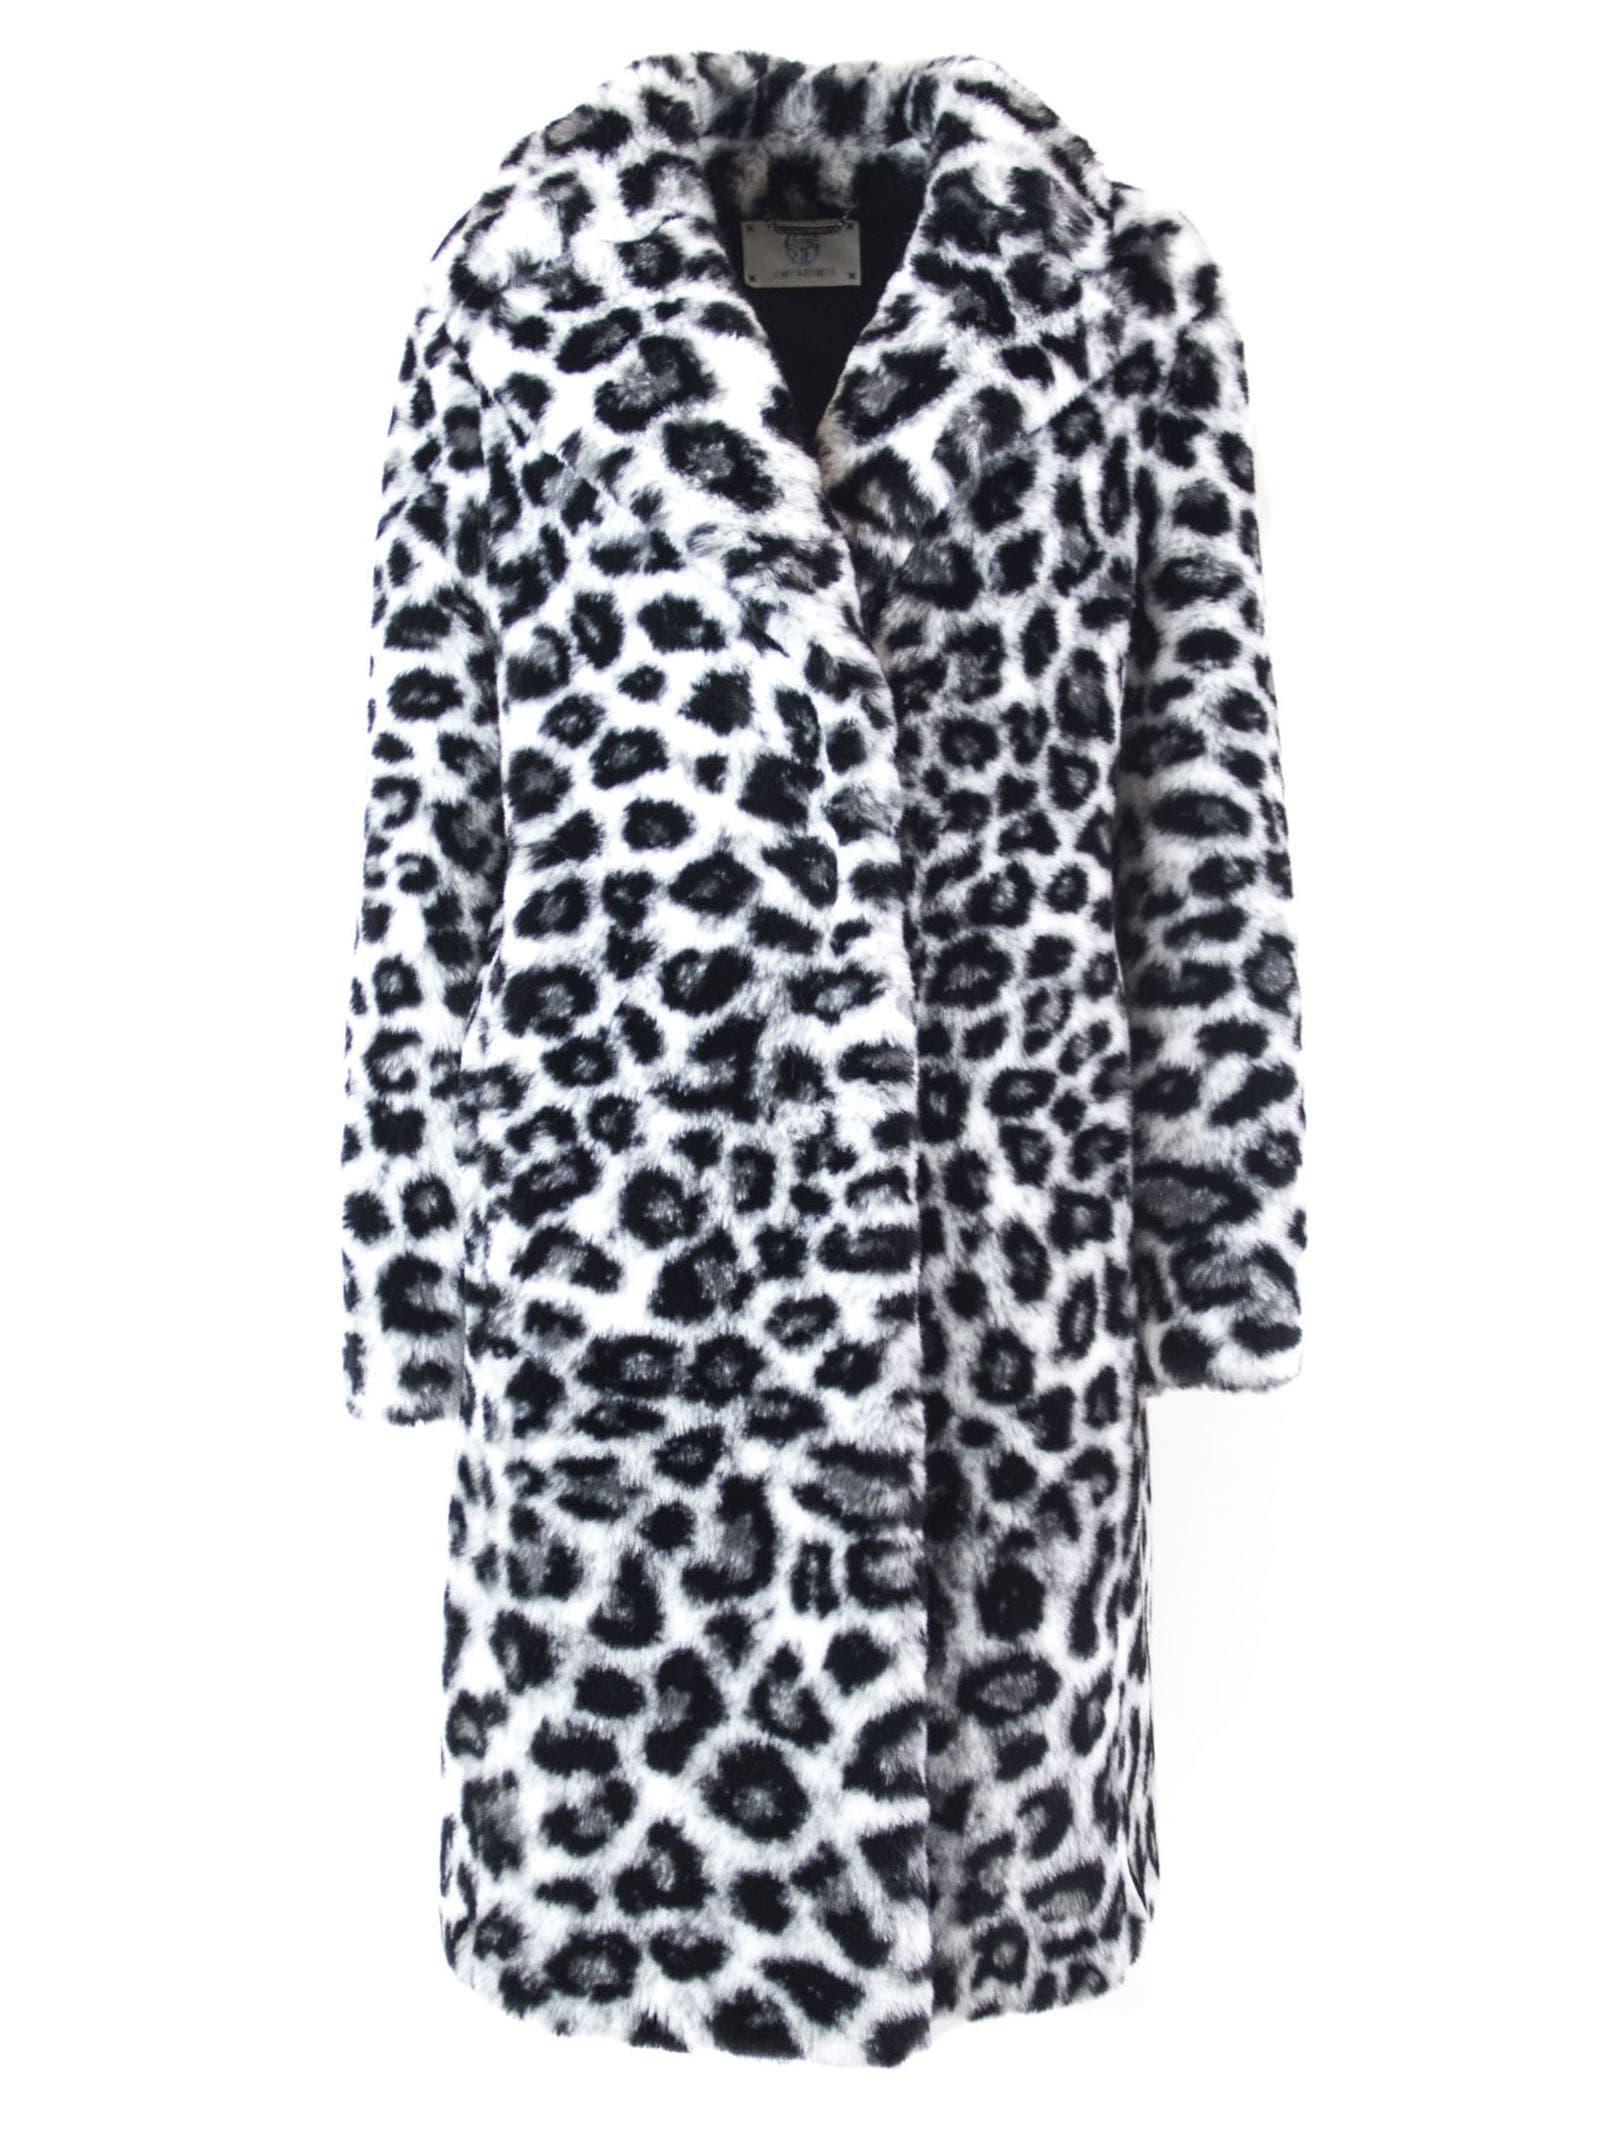 Alberta Ferretti White And Black Faux Fur Long Coat